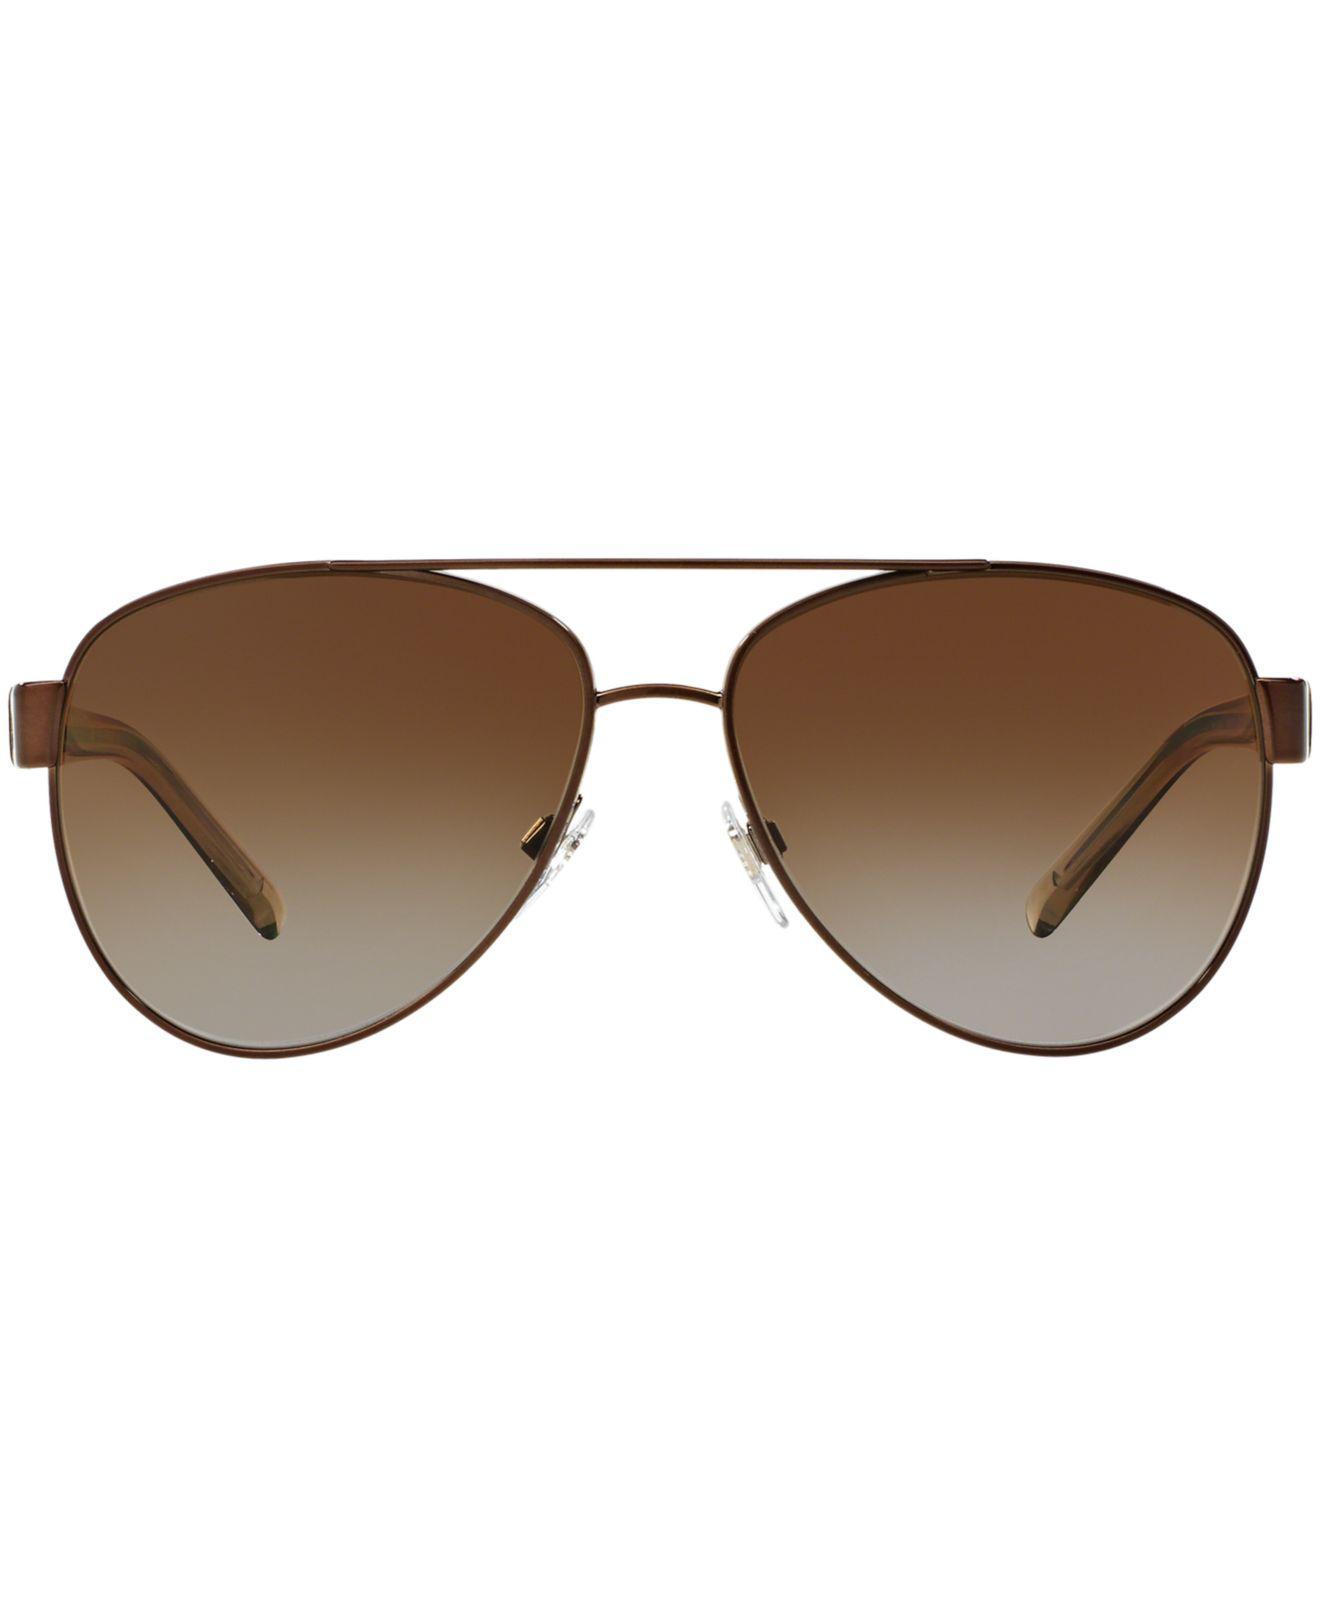 a78fd83075 Lyst - Burberry Sunglasses